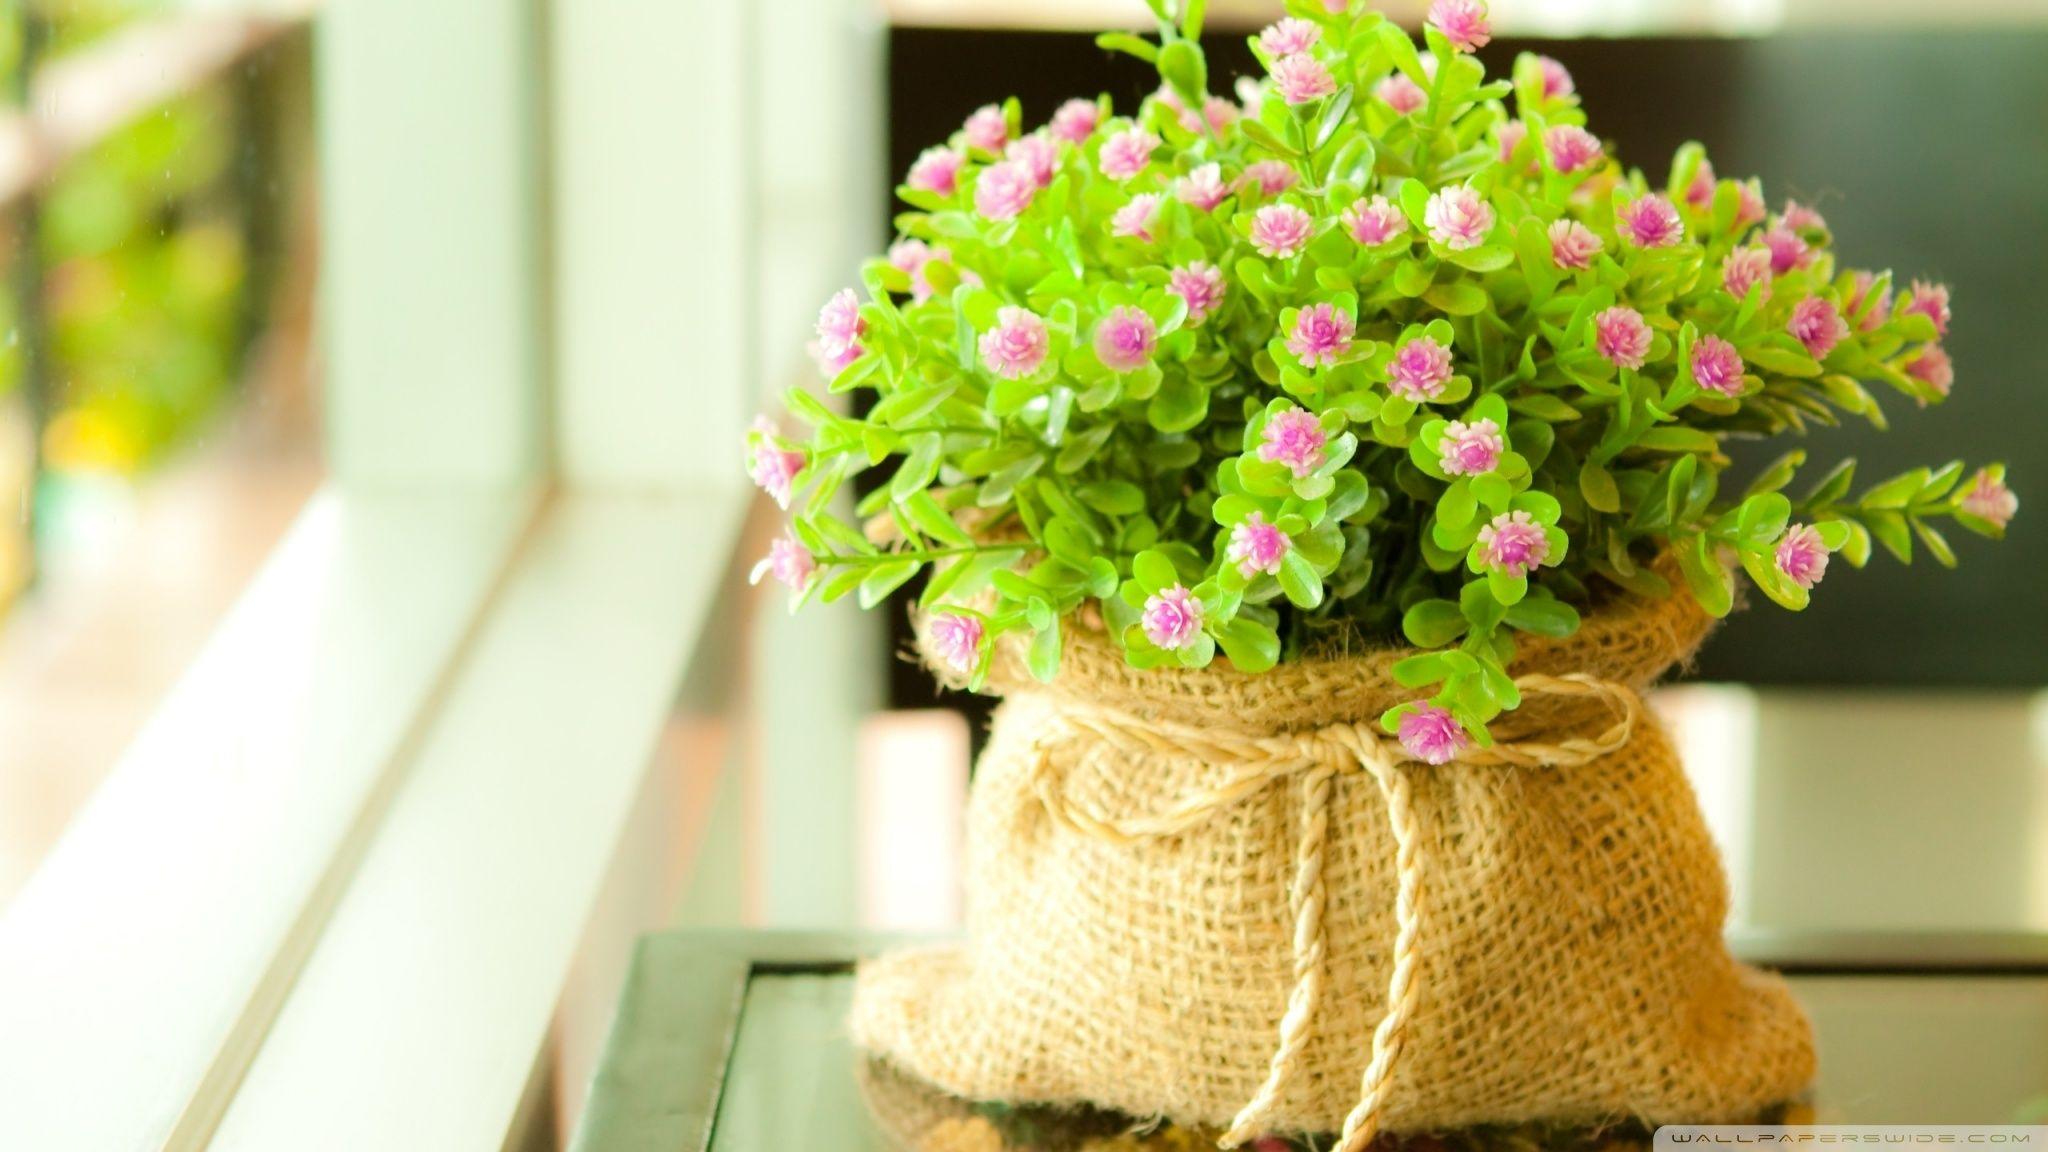 Cute Wallpapers For Desktop Background Full Screen Flower Wallpaper Good Morning Flowers Flower Pots